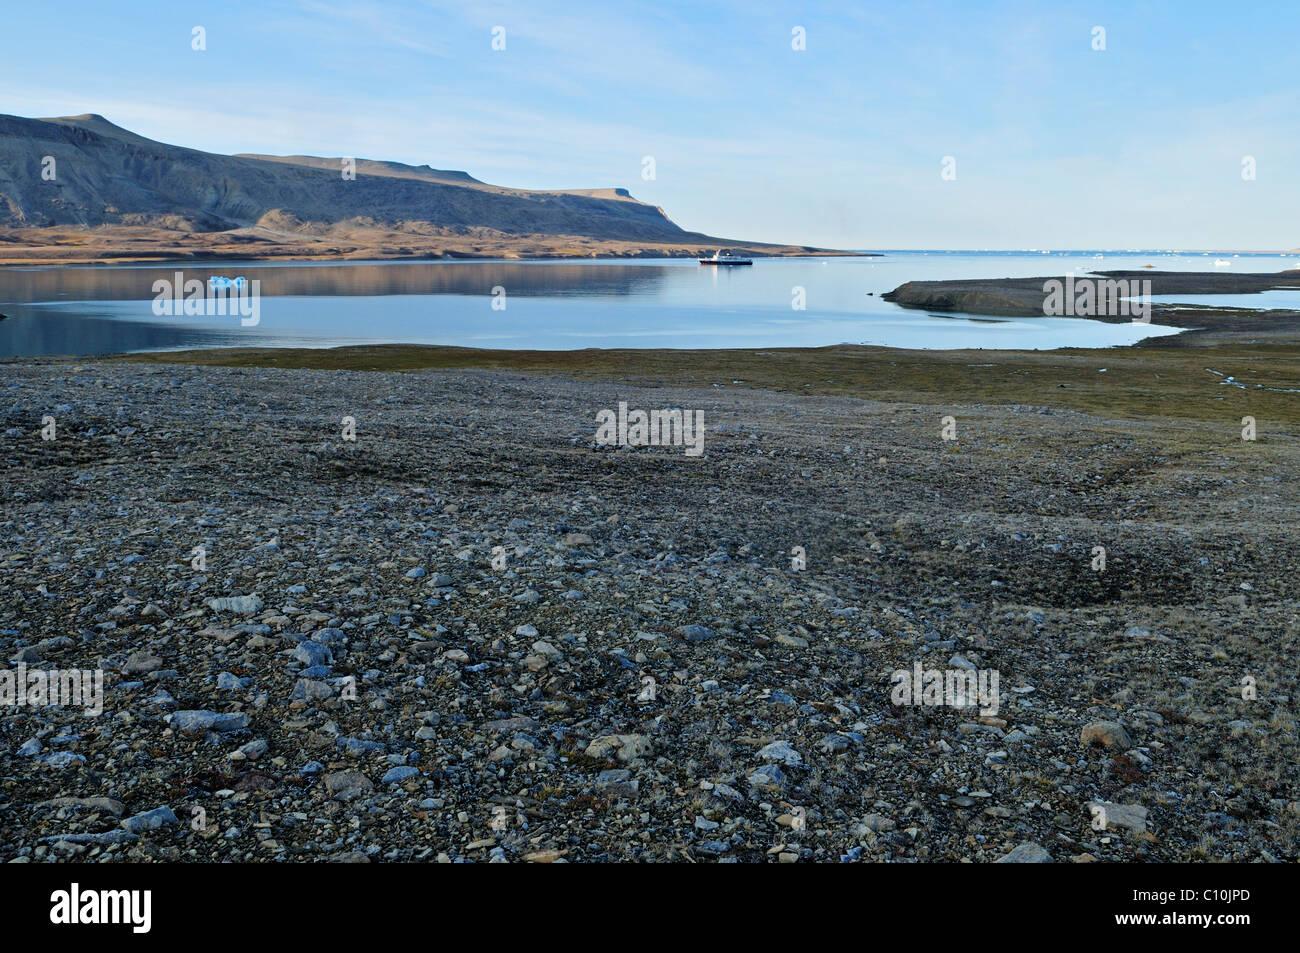 Tundra and permafrost surface at Crocker Bay, Devon Island, Northwest Passage, Nunavut, Canada, Arctic - Stock Image